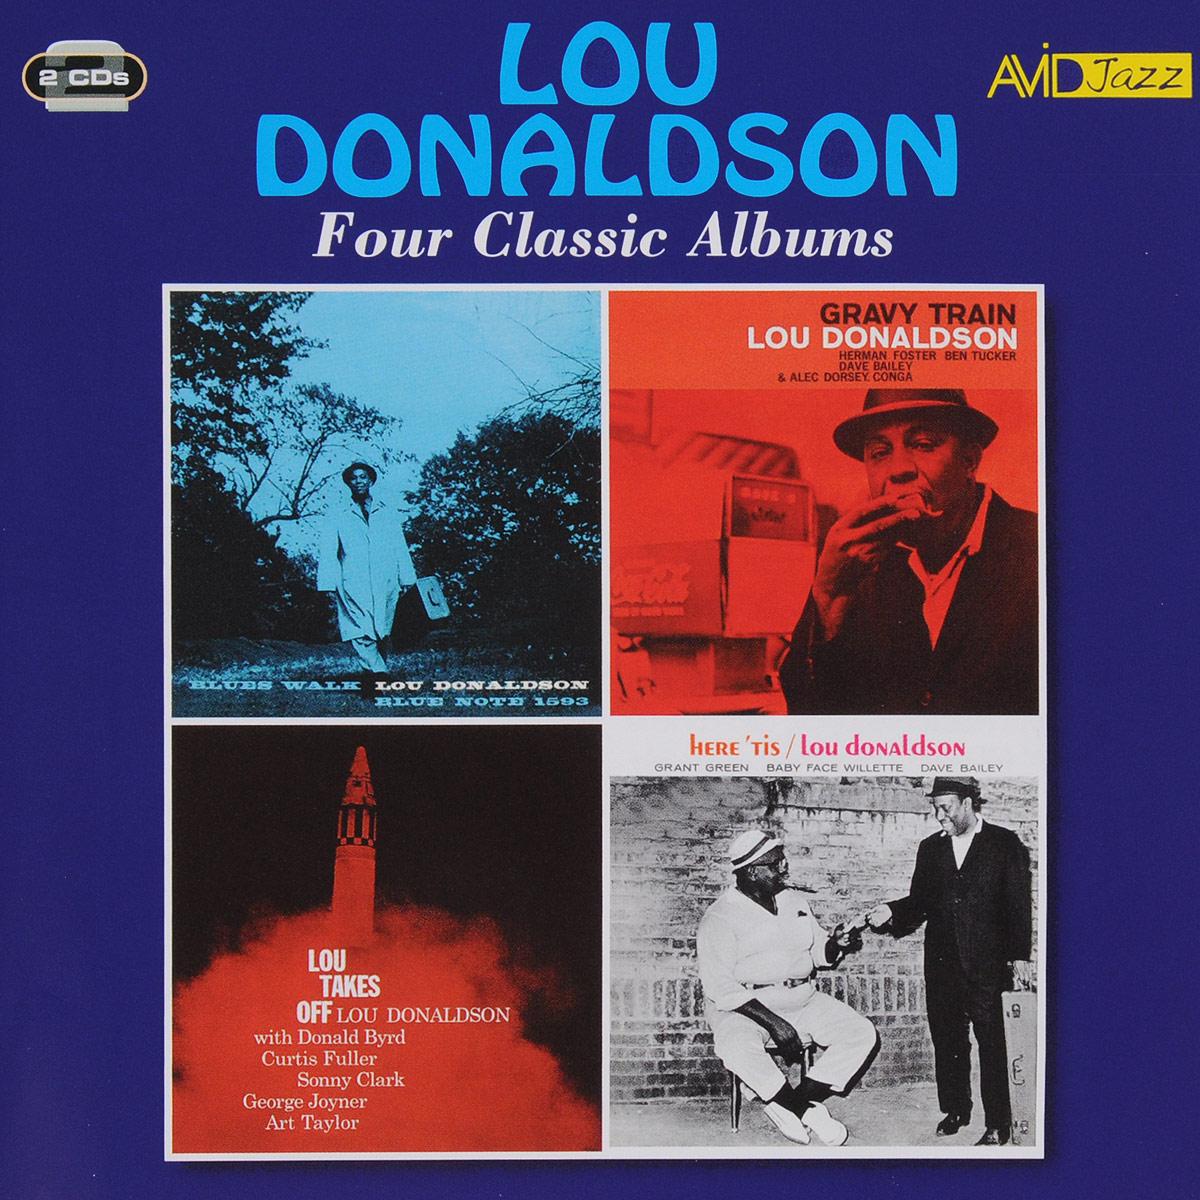 Лу Дональдсон Lou Donaldson. Four Classic Albums (2 CD) каунт бэйси count basie four classic albums plus 2 cd